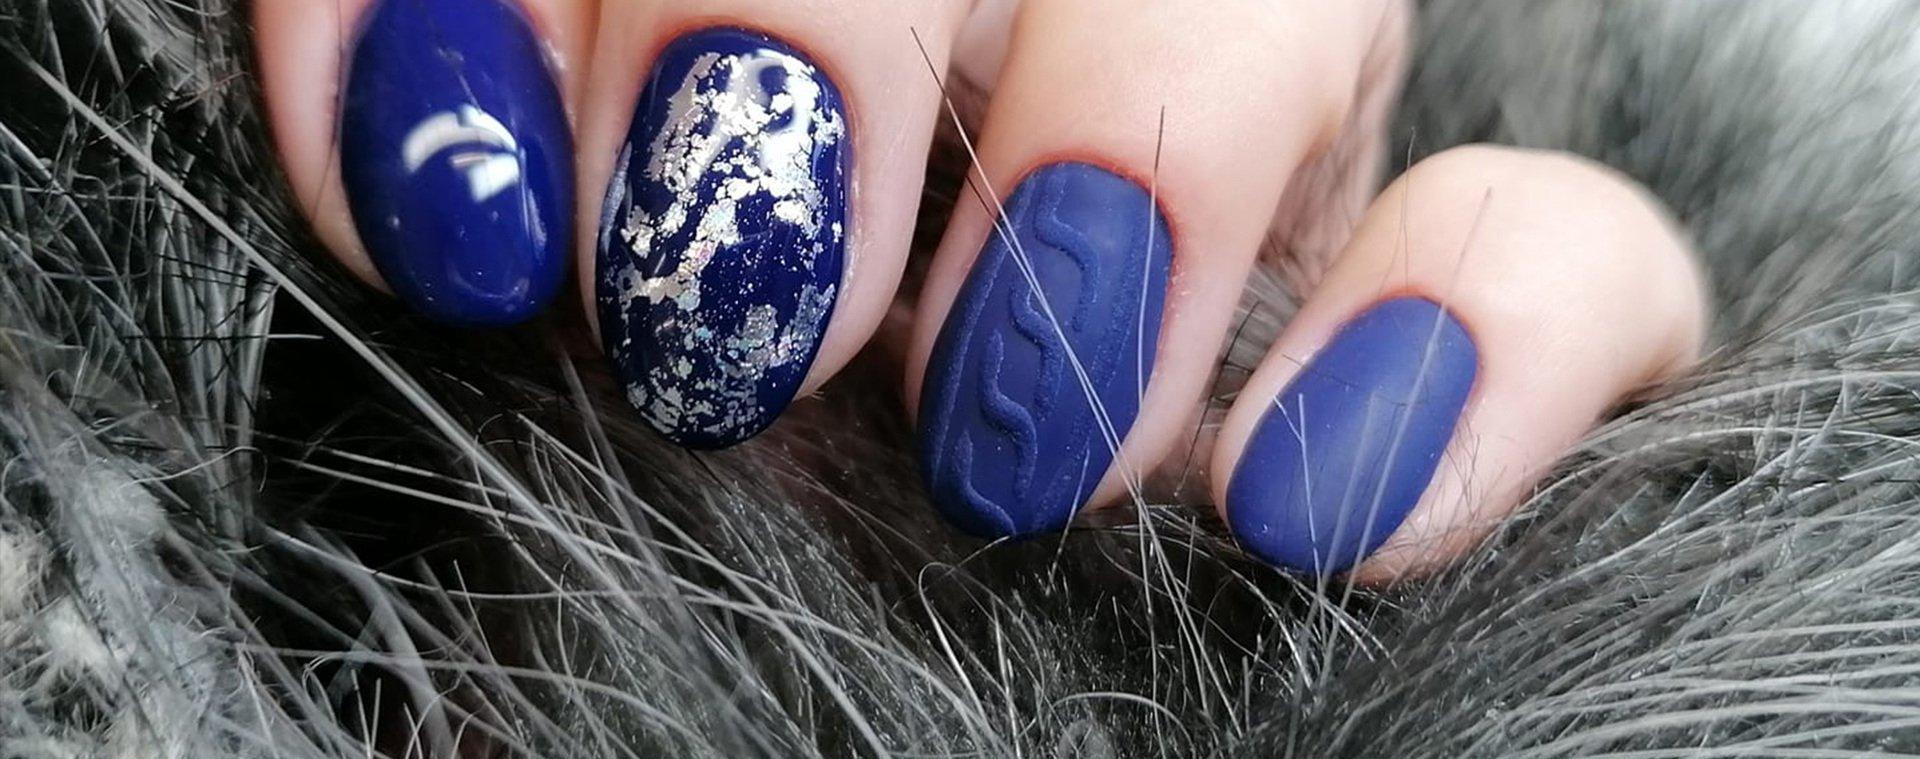 Indigo Nails Mouscron - Onglerie - Beauté du regard